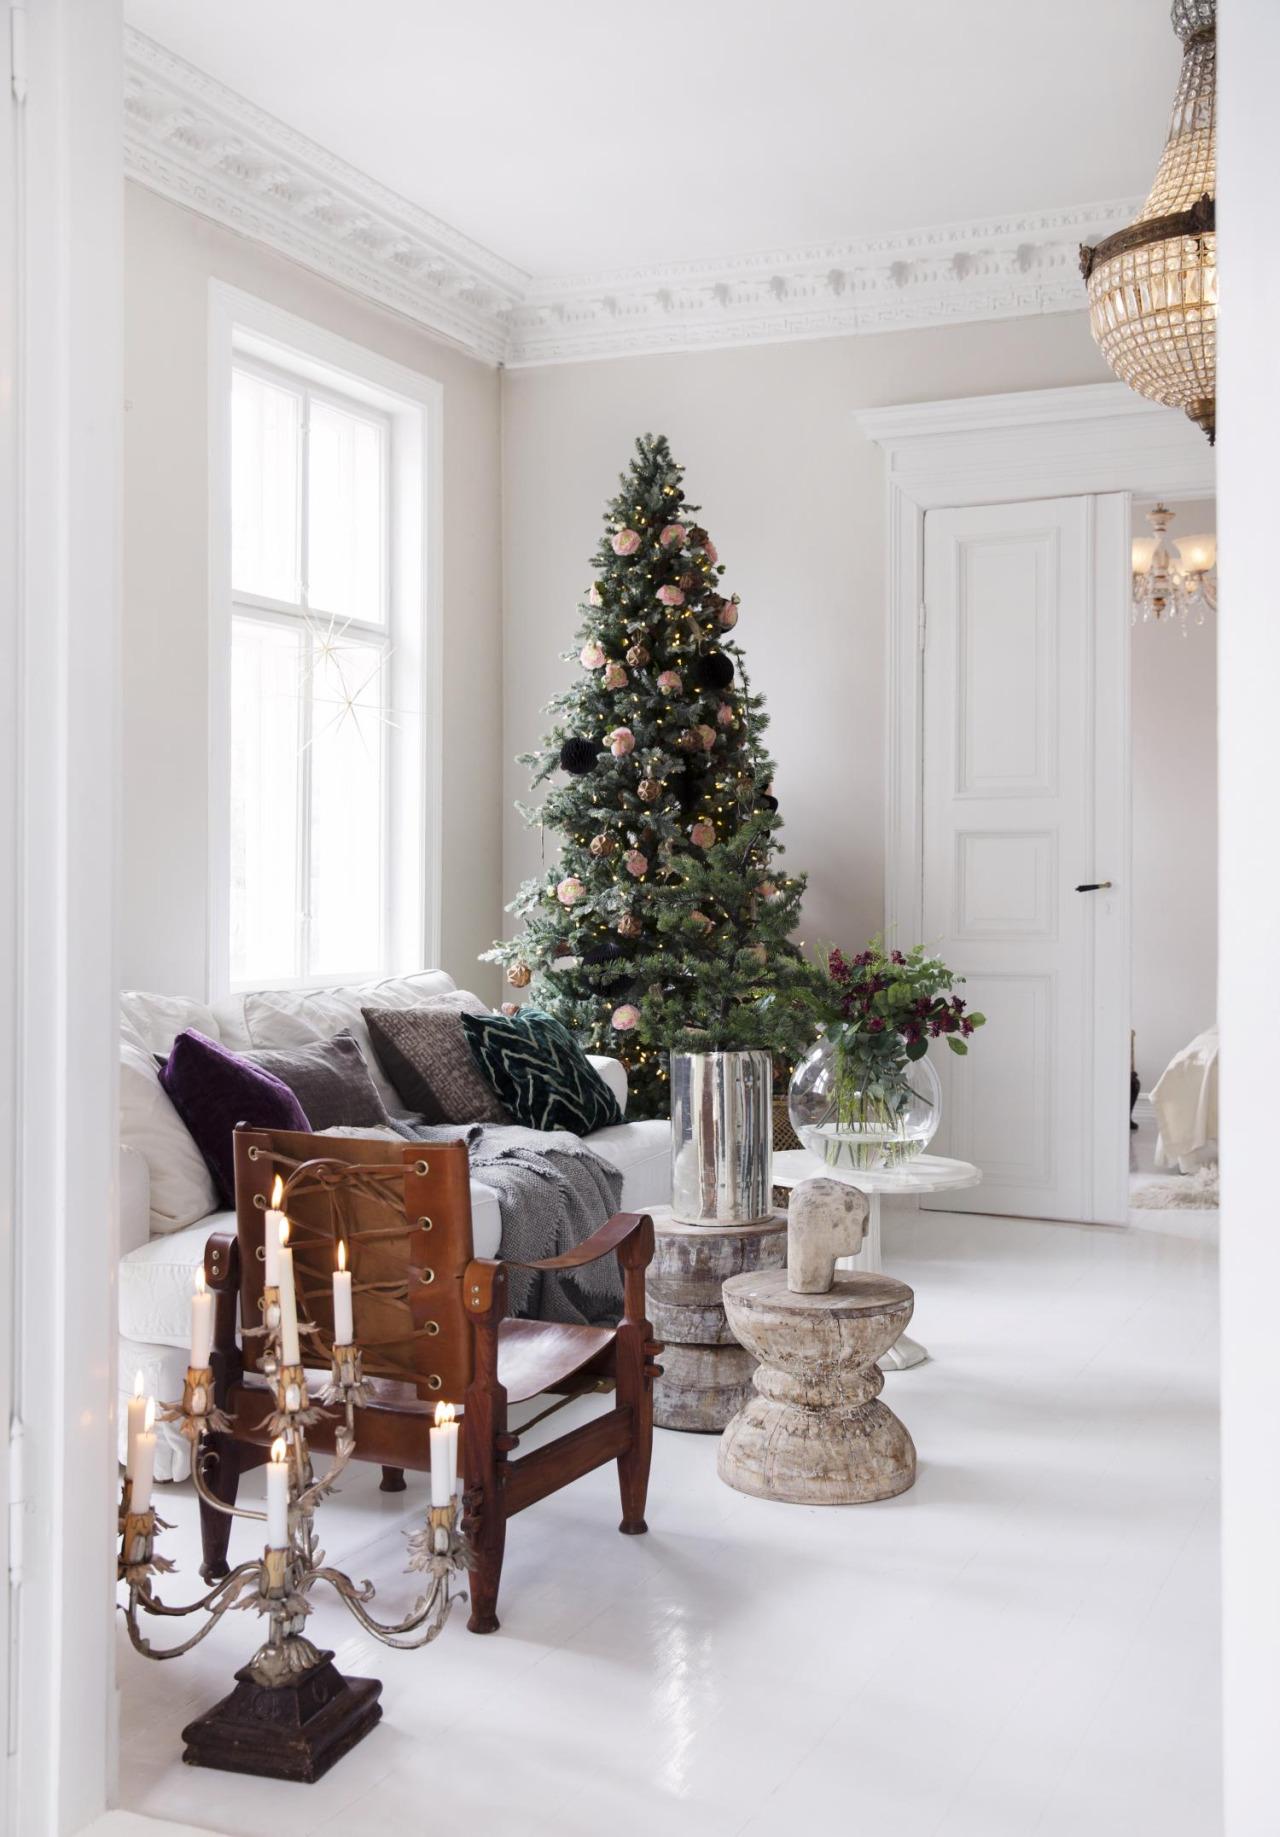 A Dreamy Christmas Home2 ...